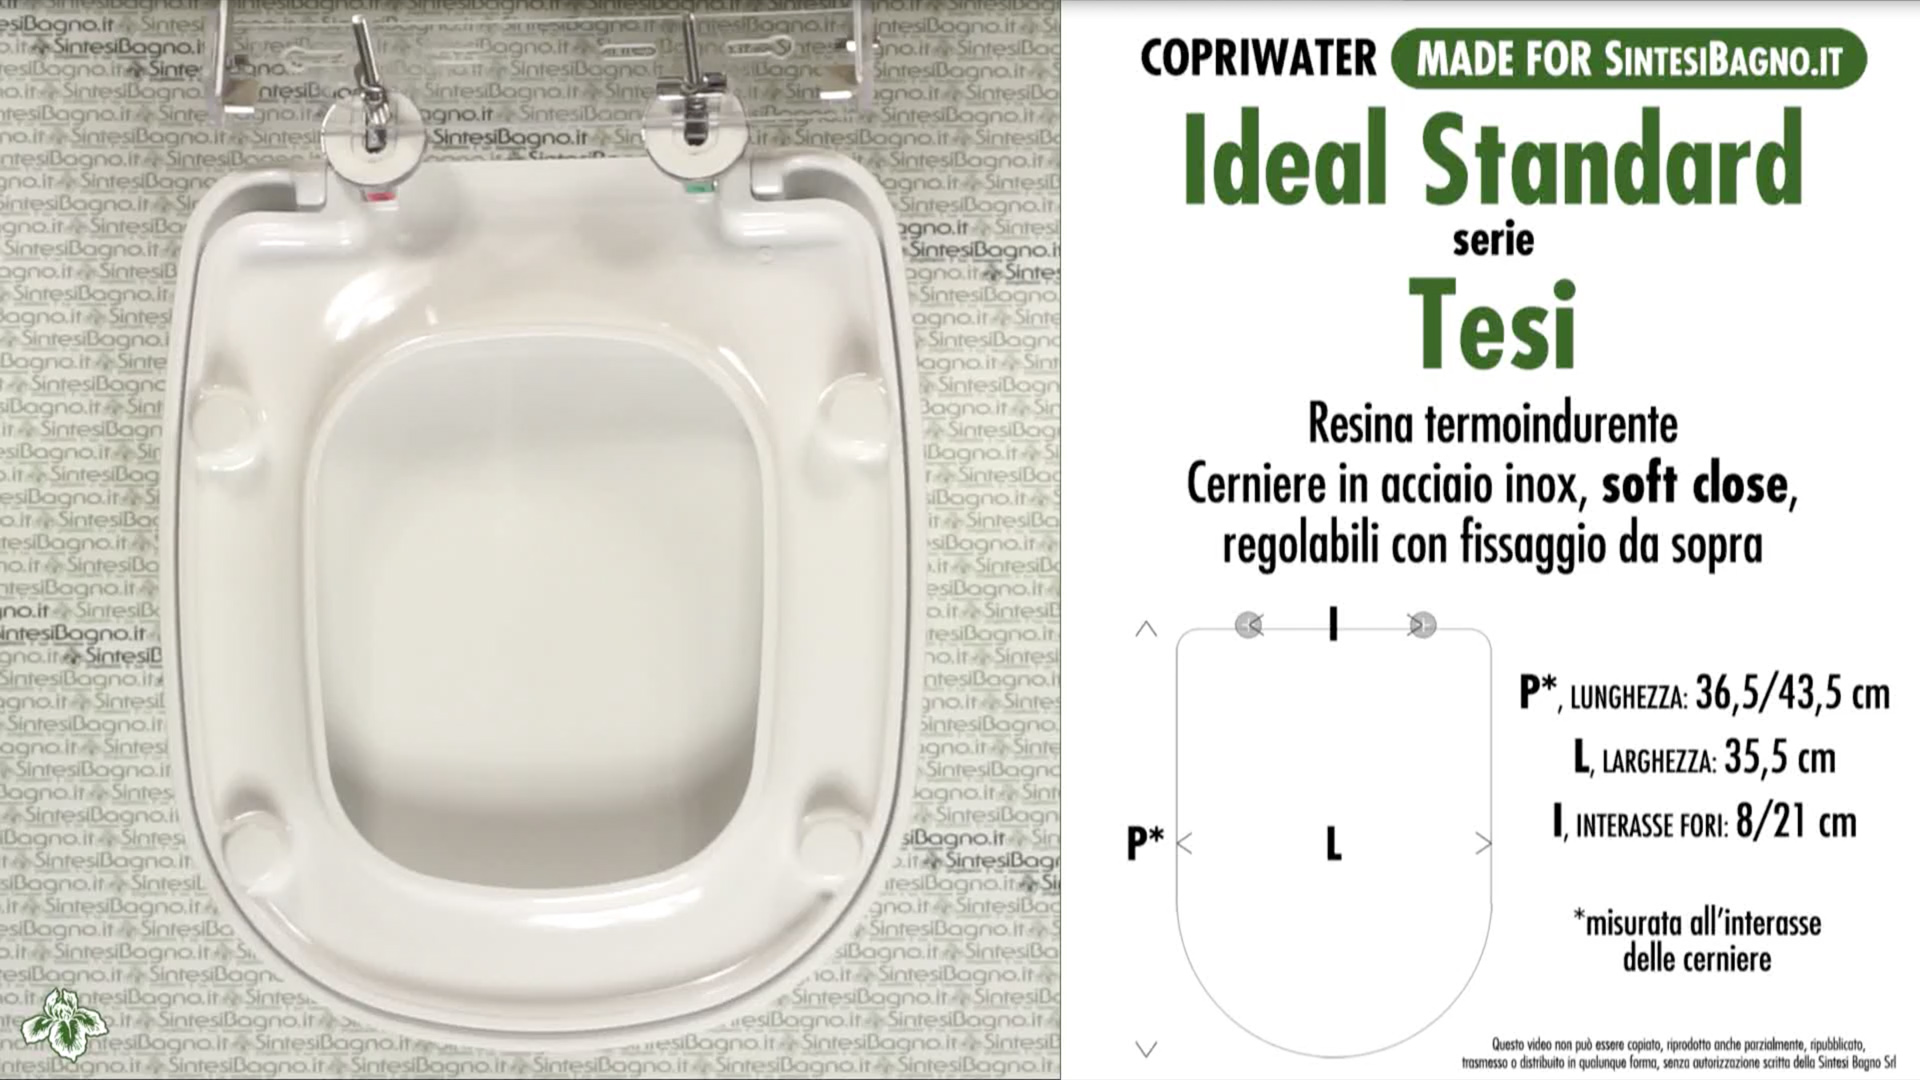 Sedile Wc Ideal Standard Tesi.Wc Seat Made For Wc Tesi Ideal Standard Model Soft Close Type Dedicated Sintesibagno Shop Online